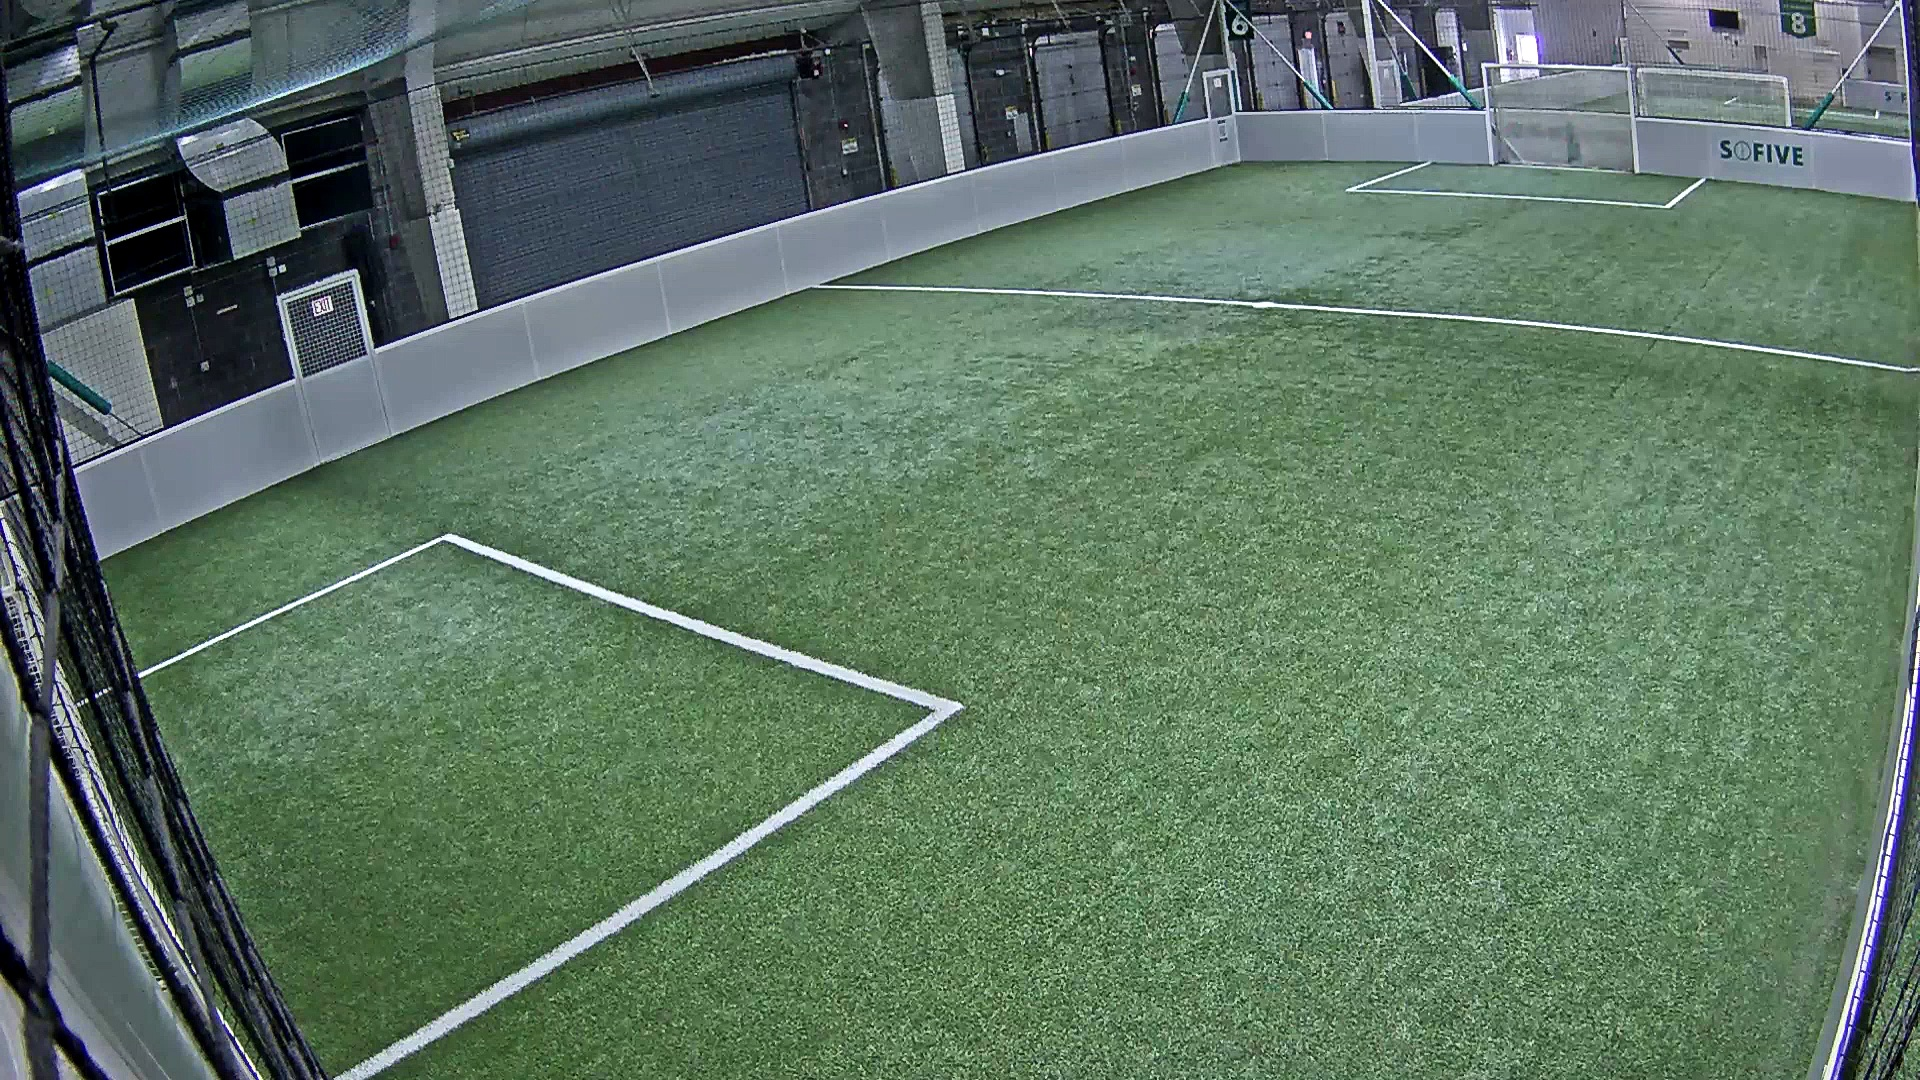 09/15/2019 13:00:01 - Sofive Soccer Centers Rockville - Maracana